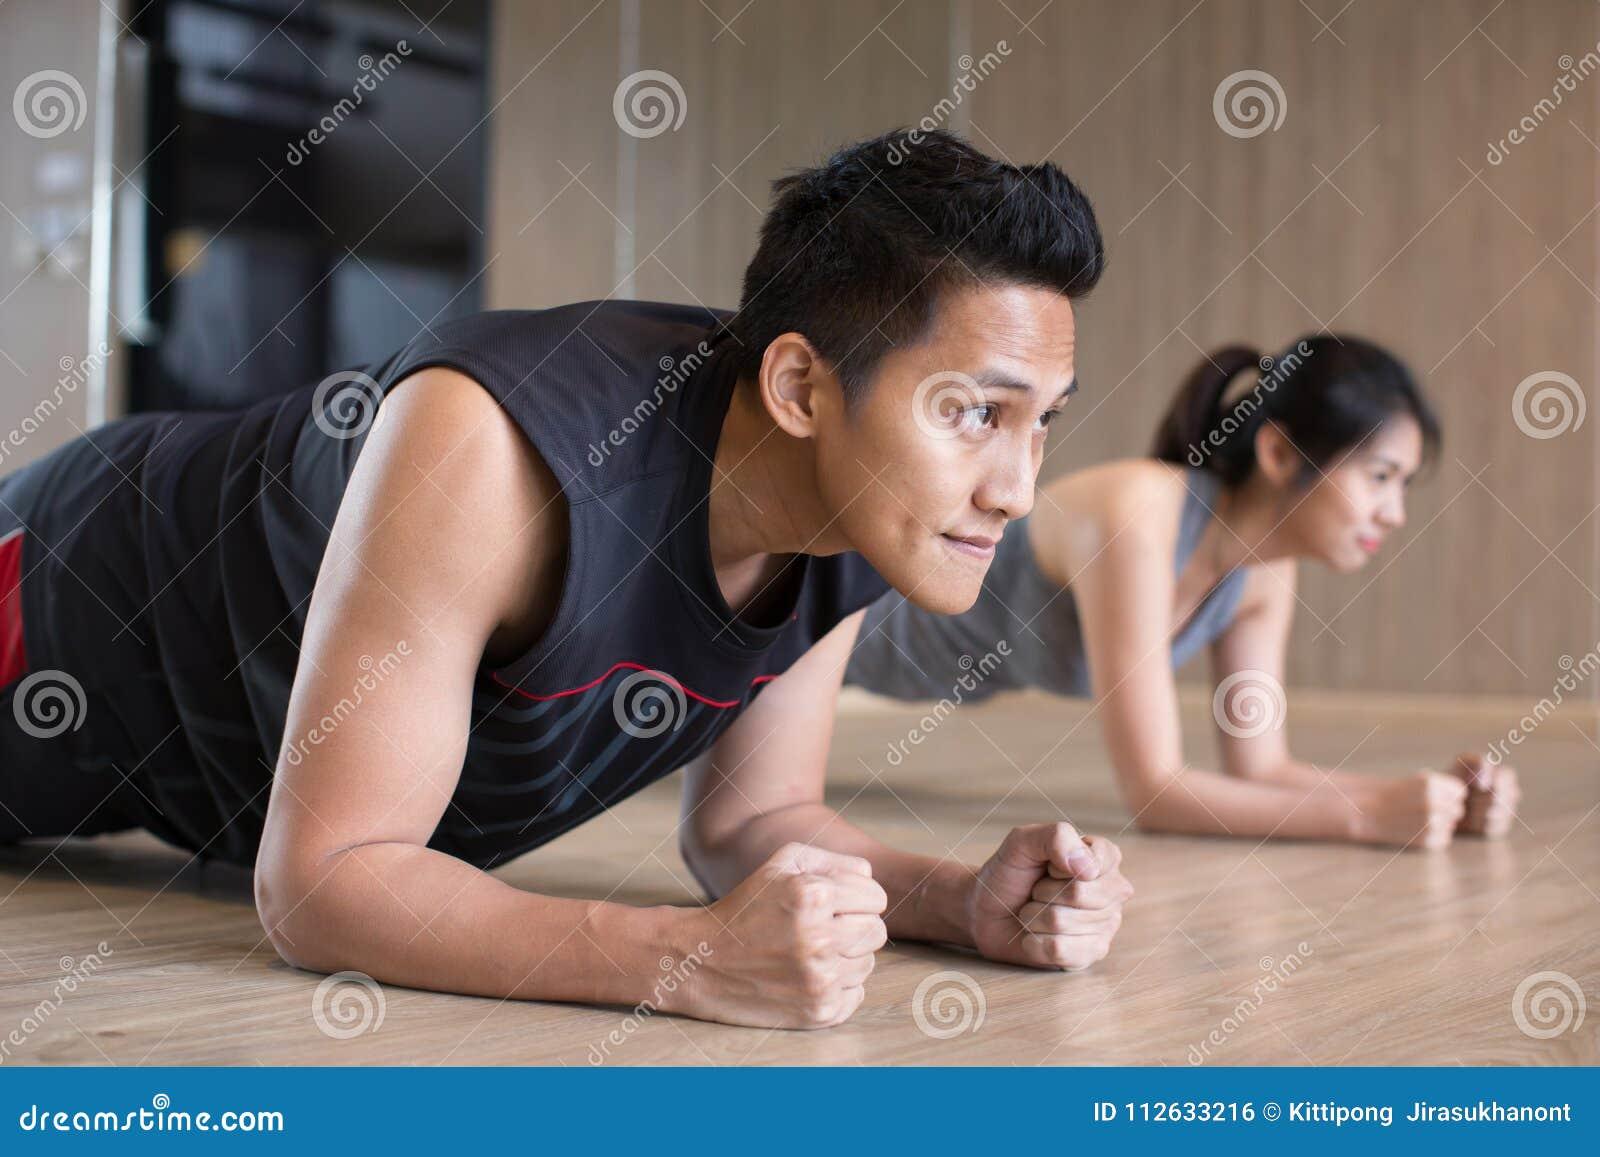 Couple doing plank